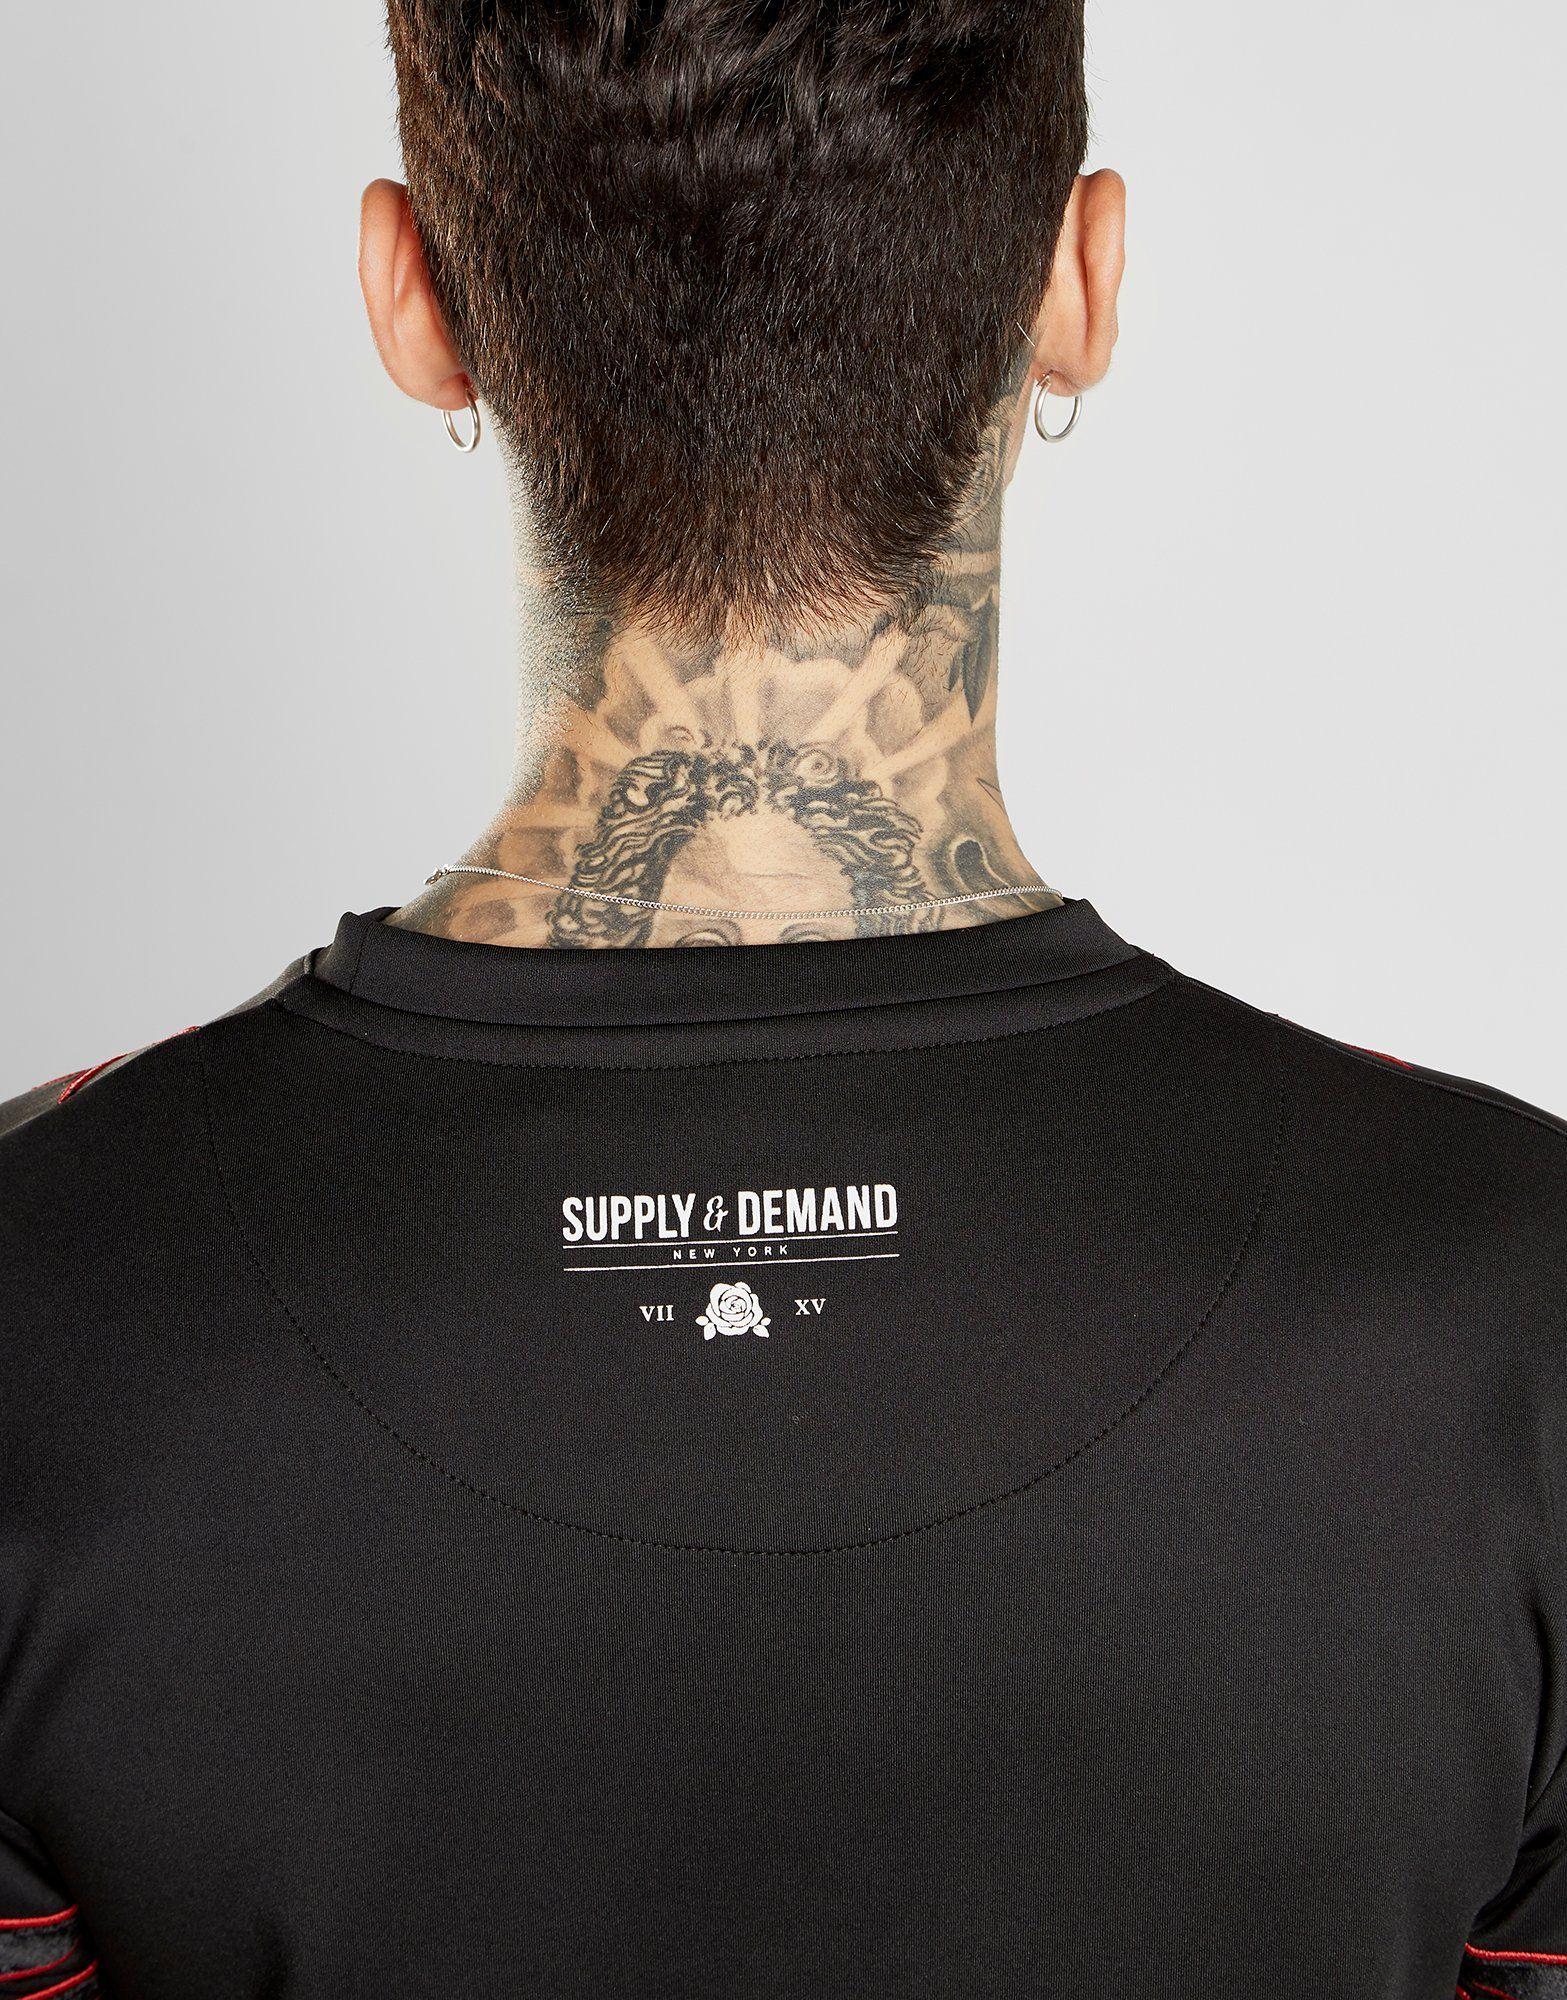 Supply & Demand Lux T-Shirt